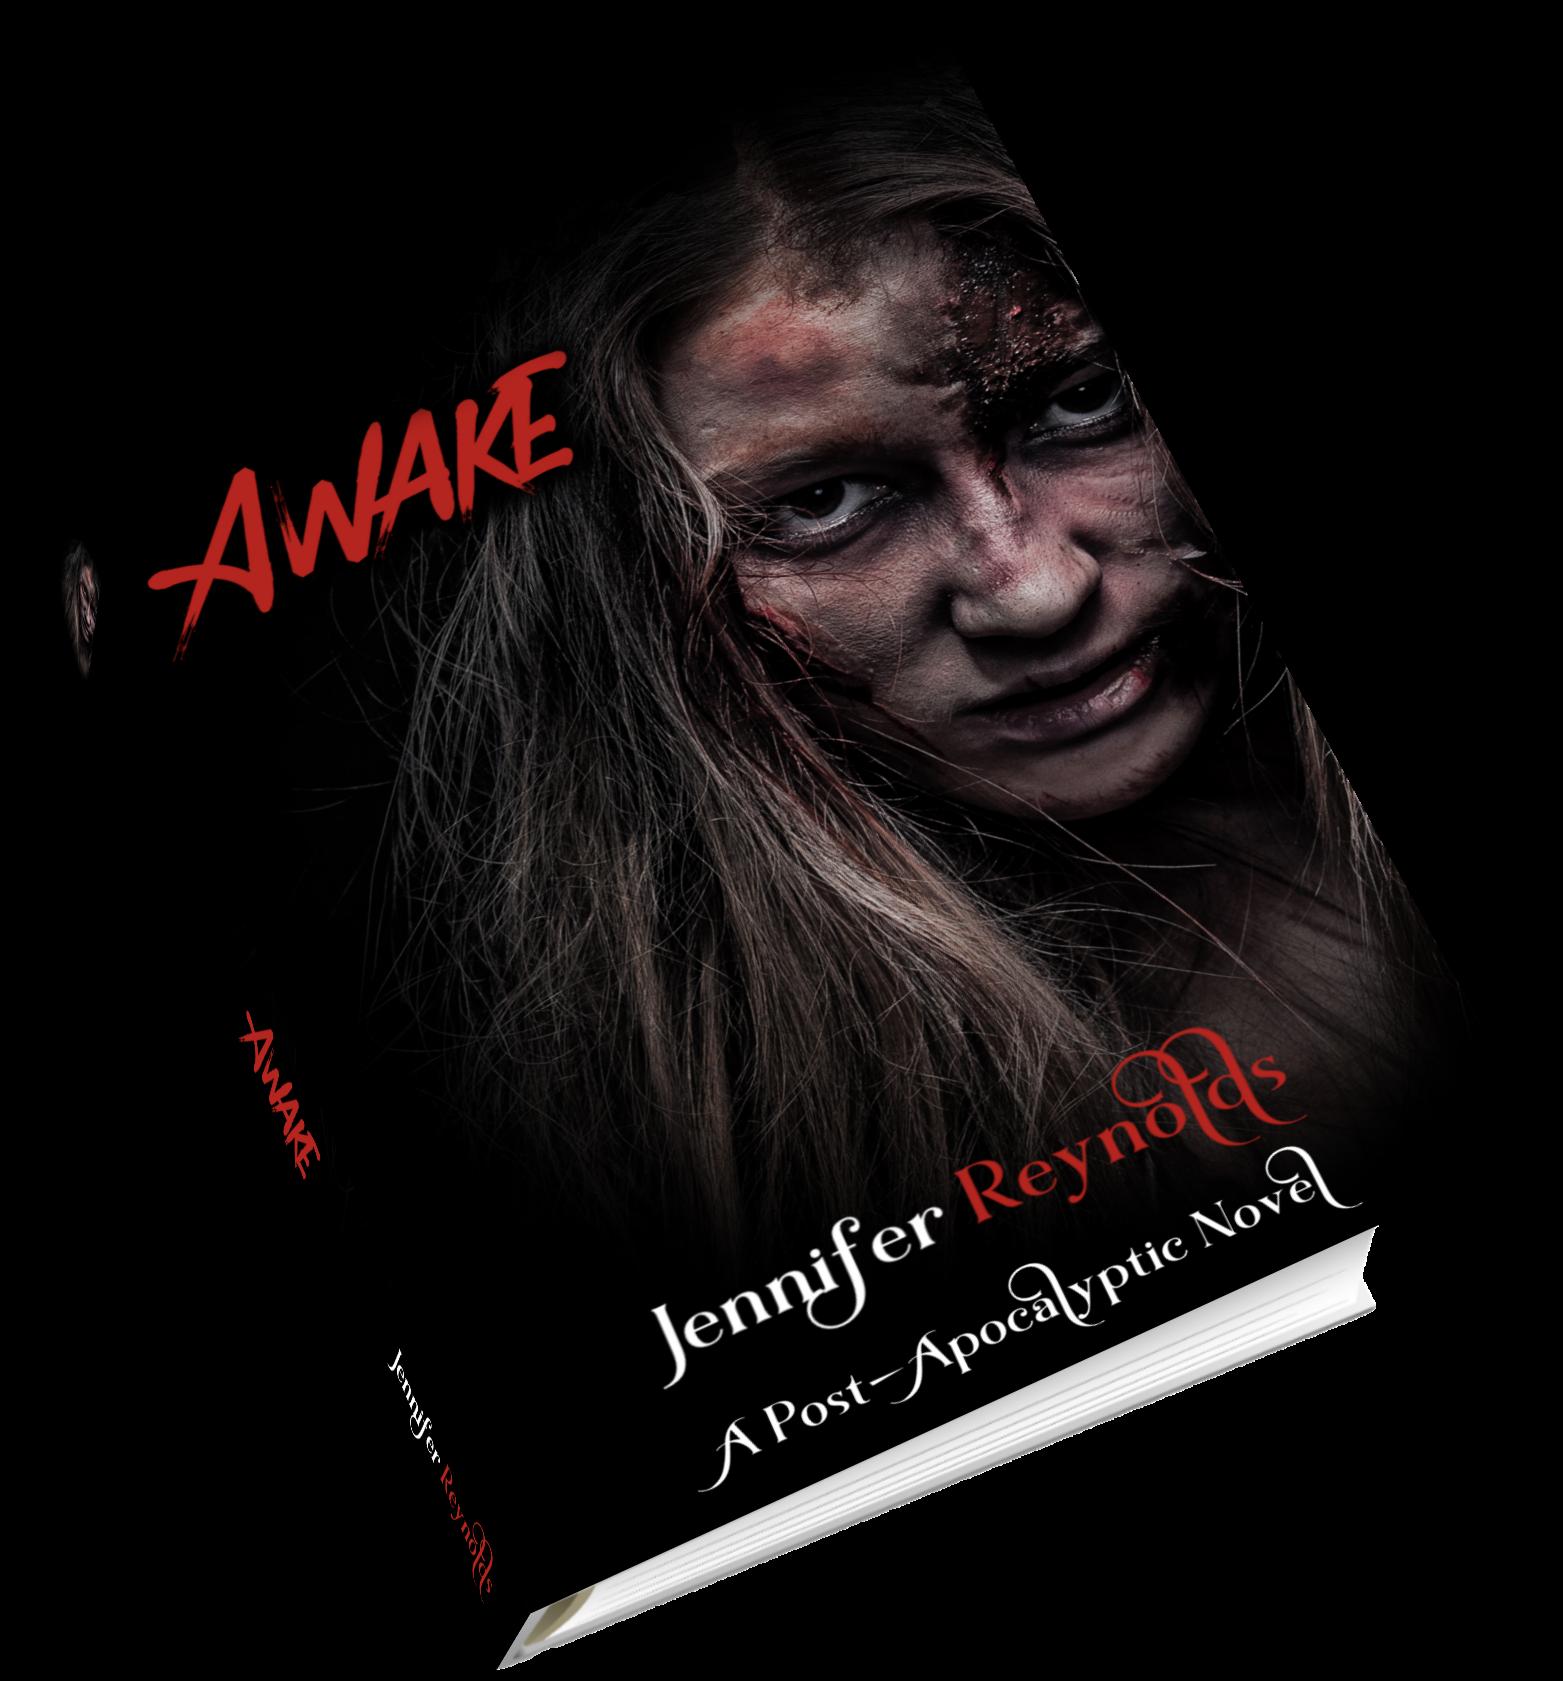 Awake 3D Cover_Reynolds_8-28-2019.png